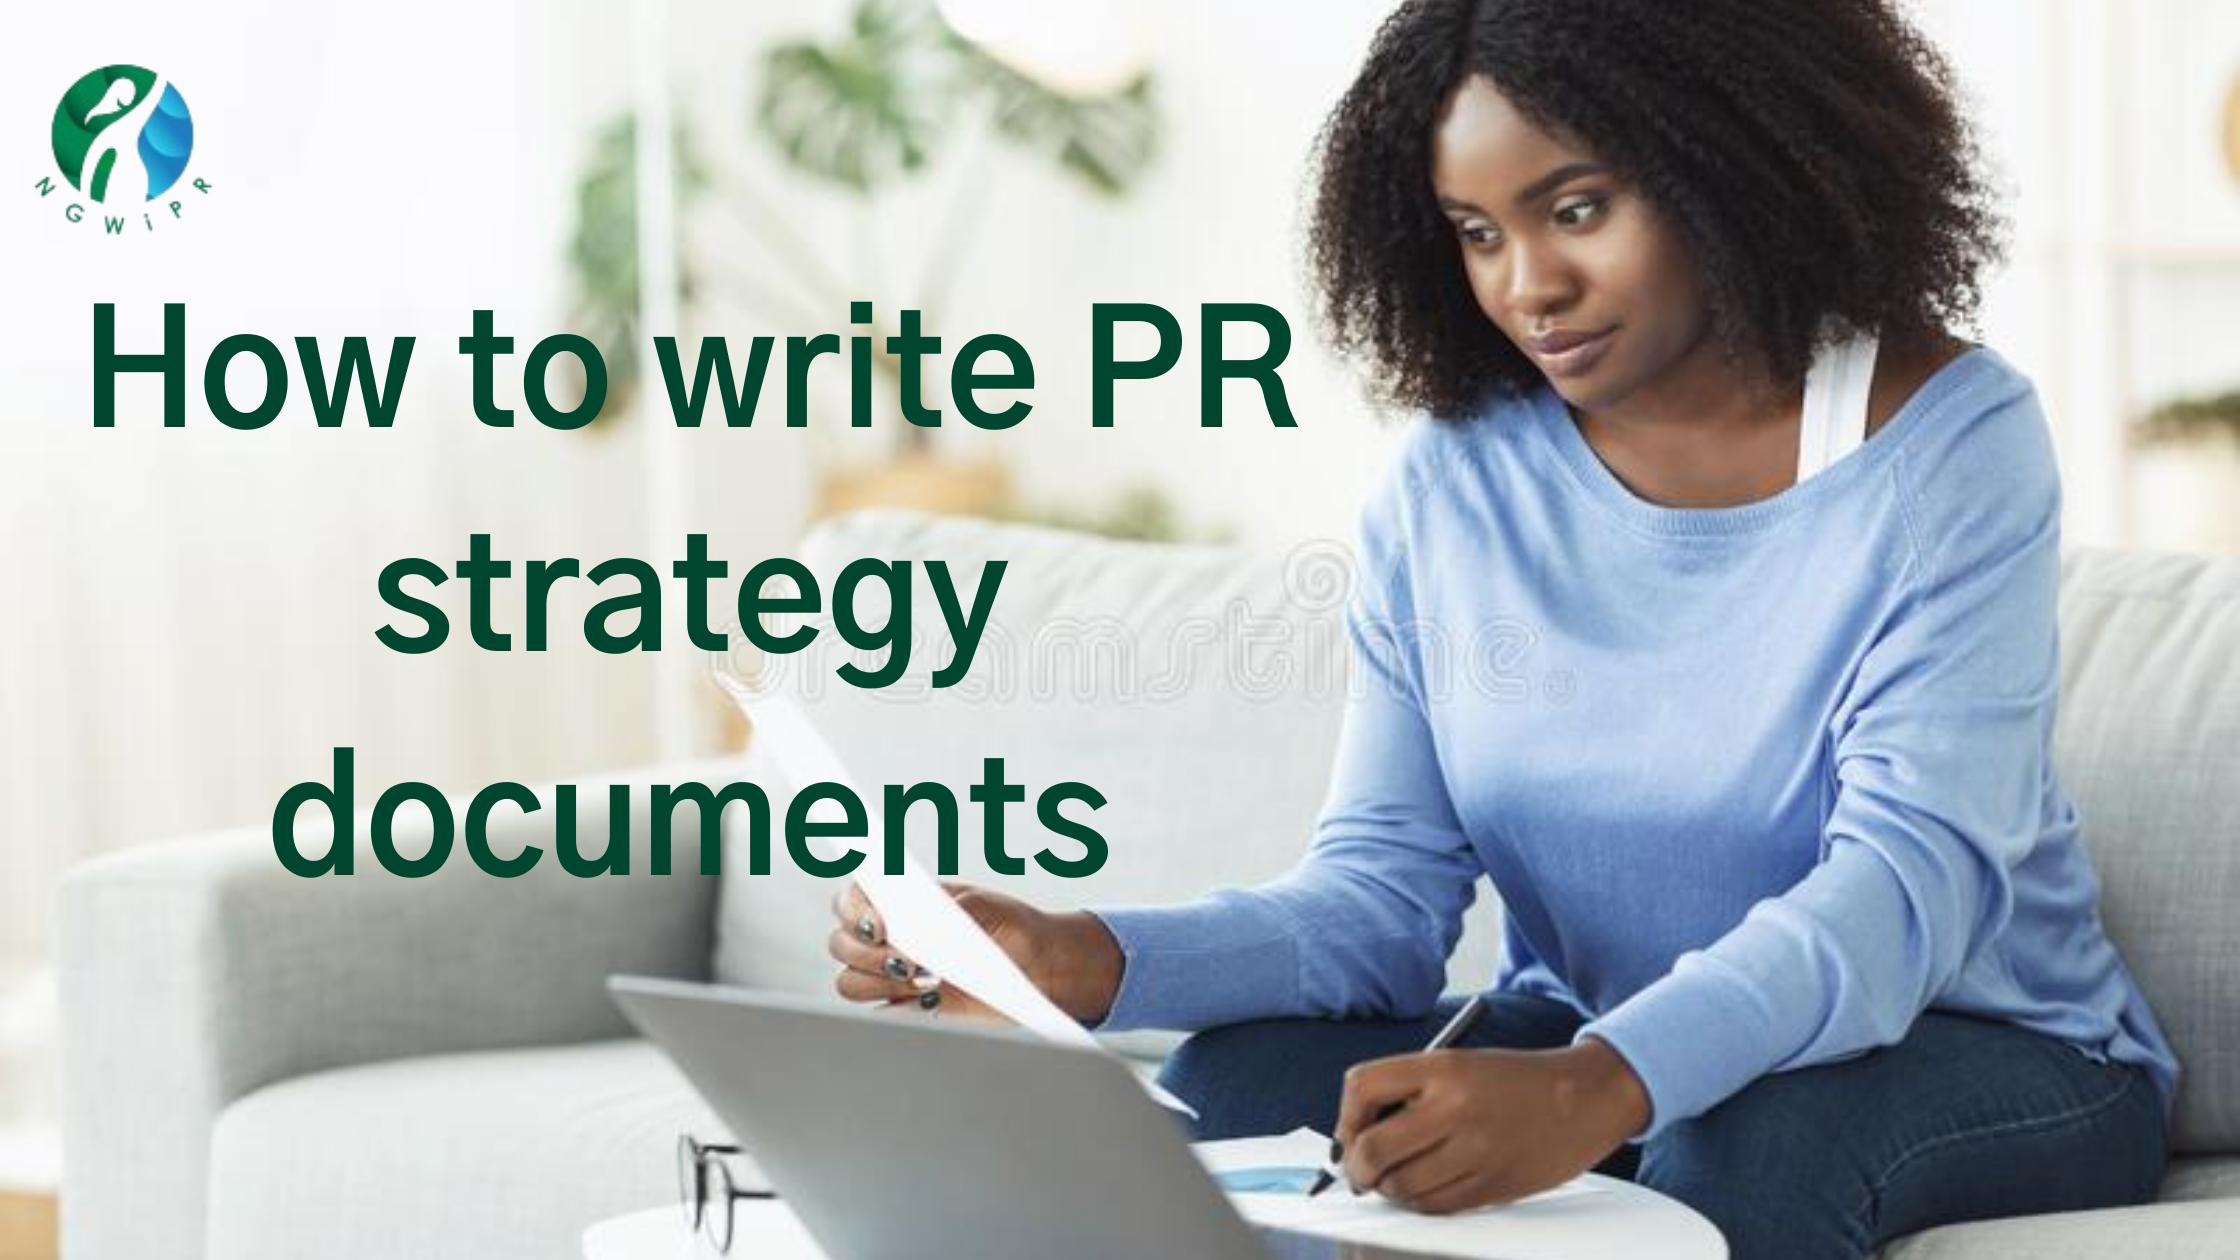 How to Write PR Strategy Documents